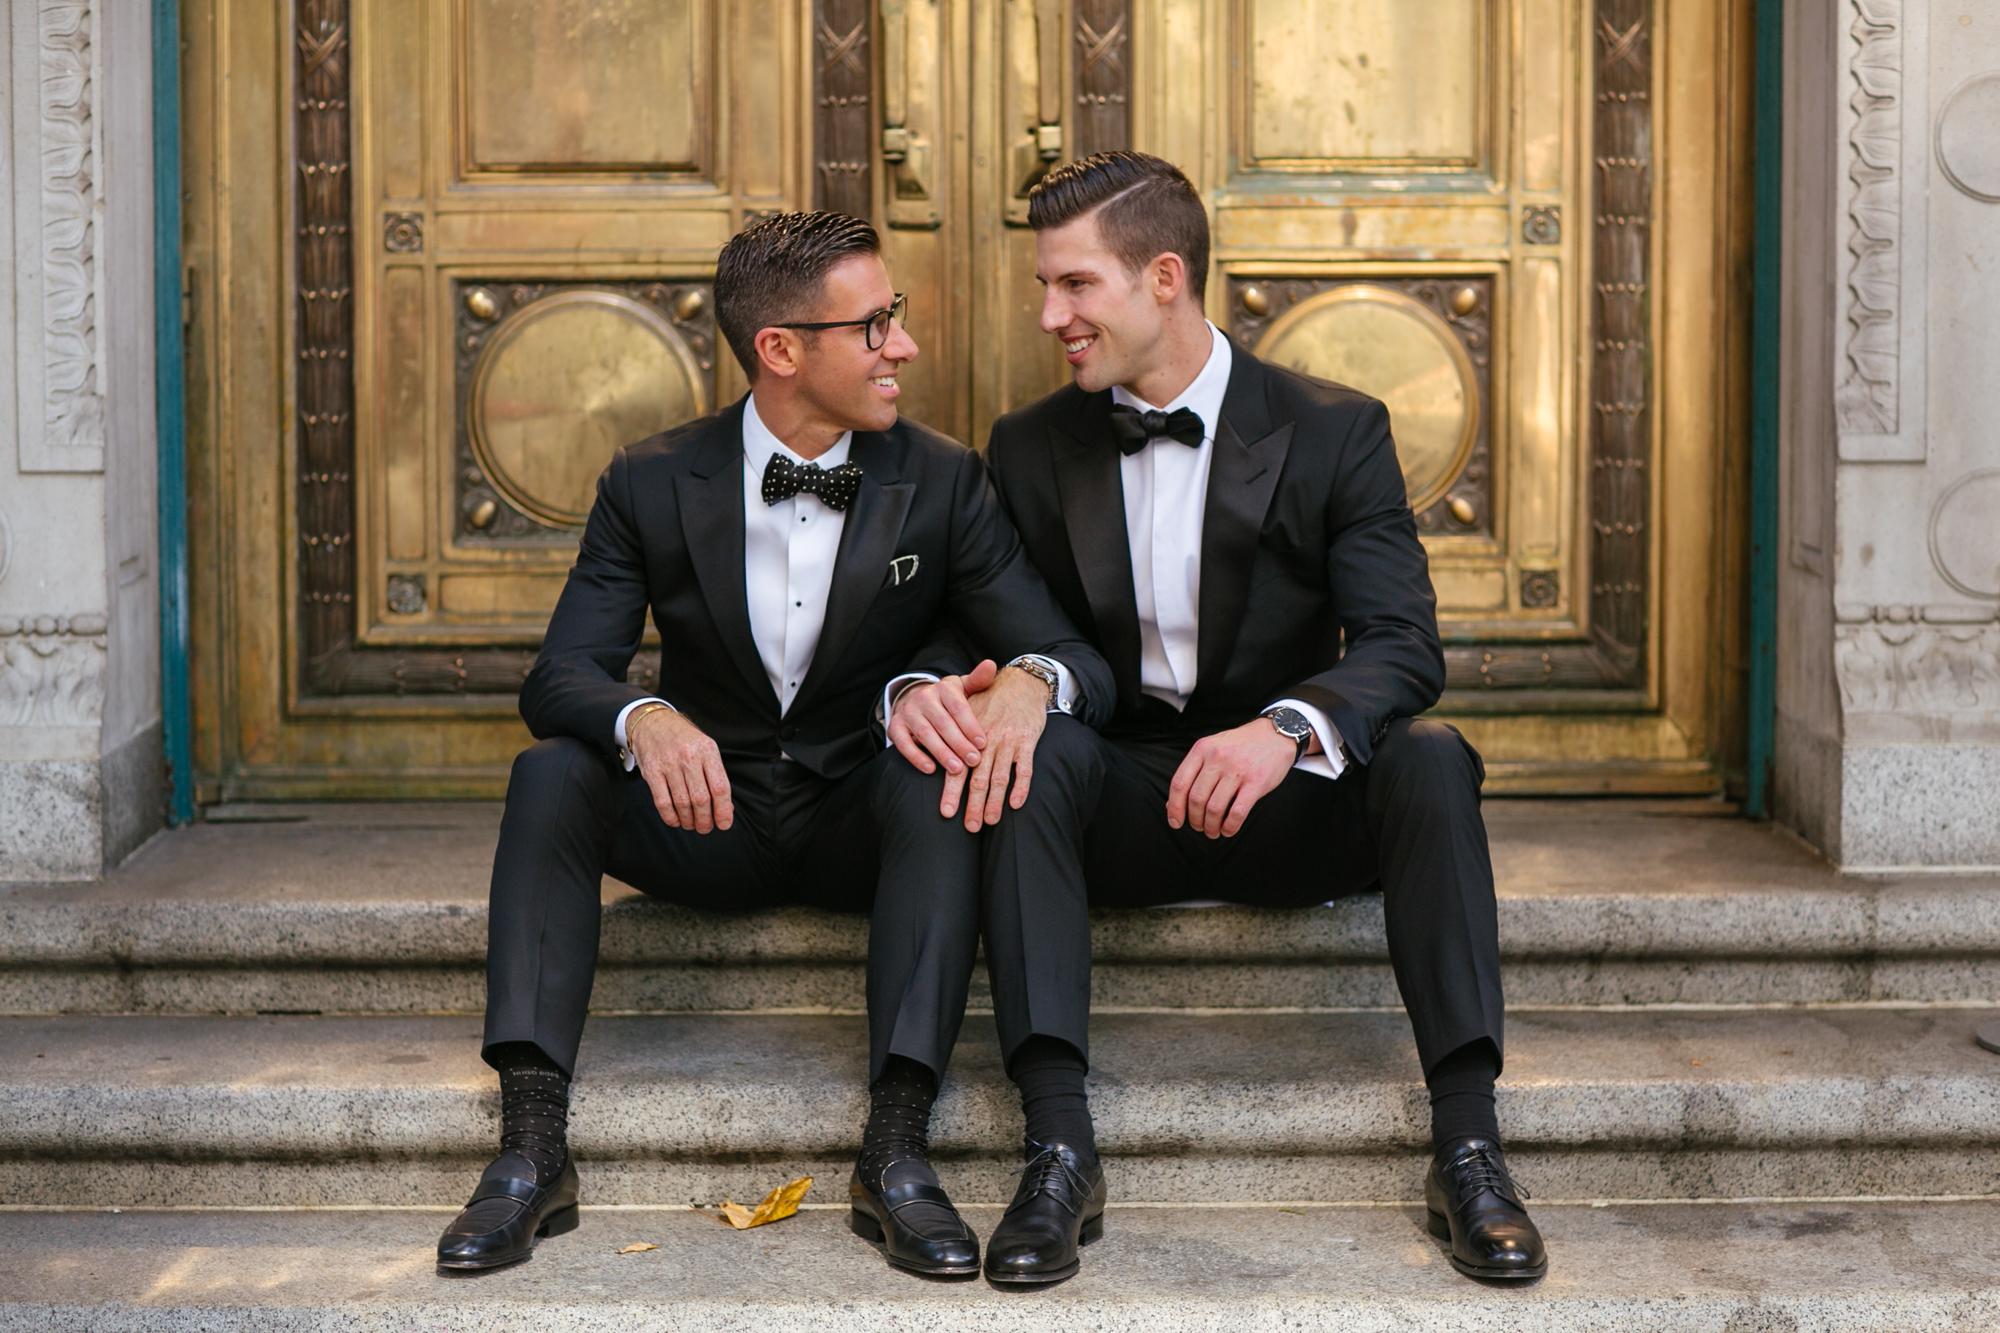 vancouver-luxury-wedding-photographer-lori-miles-193.jpg